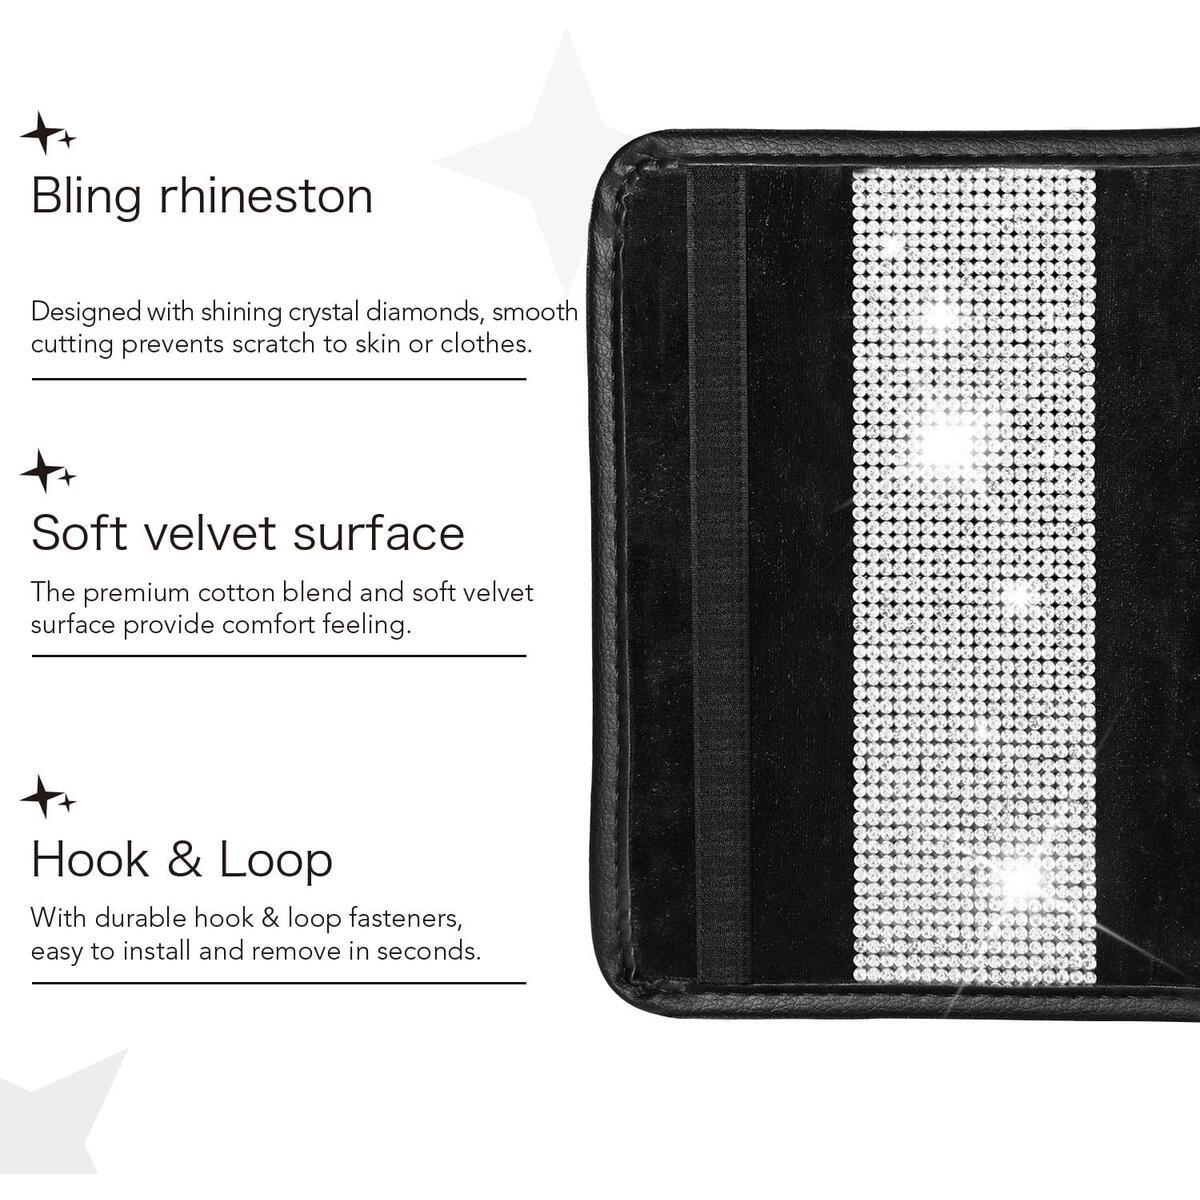 HOUSE DAY Diamond Car Seat Straps Shoulder Pads Super Soft Seat Belt Covers Crystal Rhinestone Car Bling Ring Emblem Sticker Crystal Diamond Car Decor Accessories (Set1)